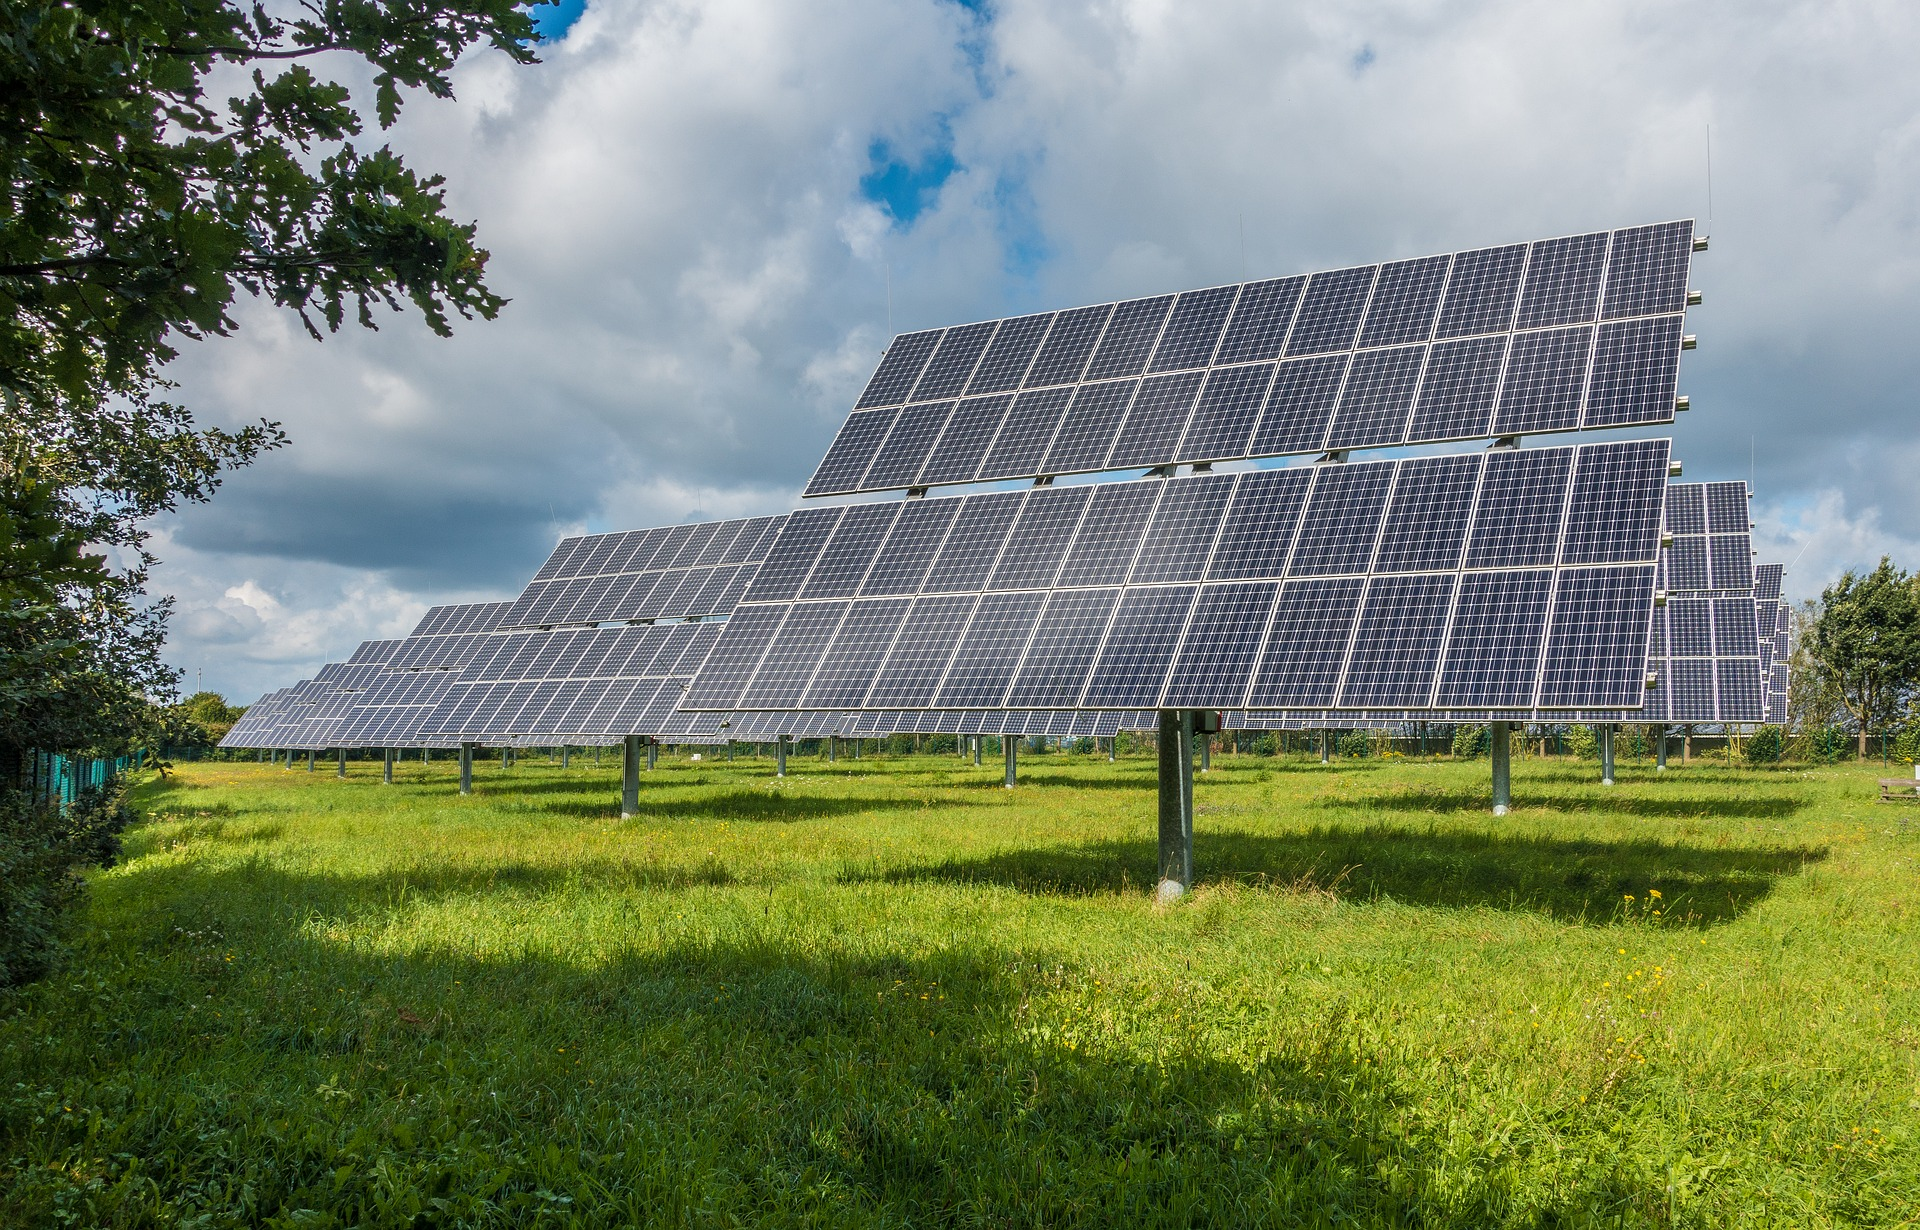 https://watt.co.uk/wp-content/uploads/2019/12/photovoltaic-system-2742302_1920.jpg